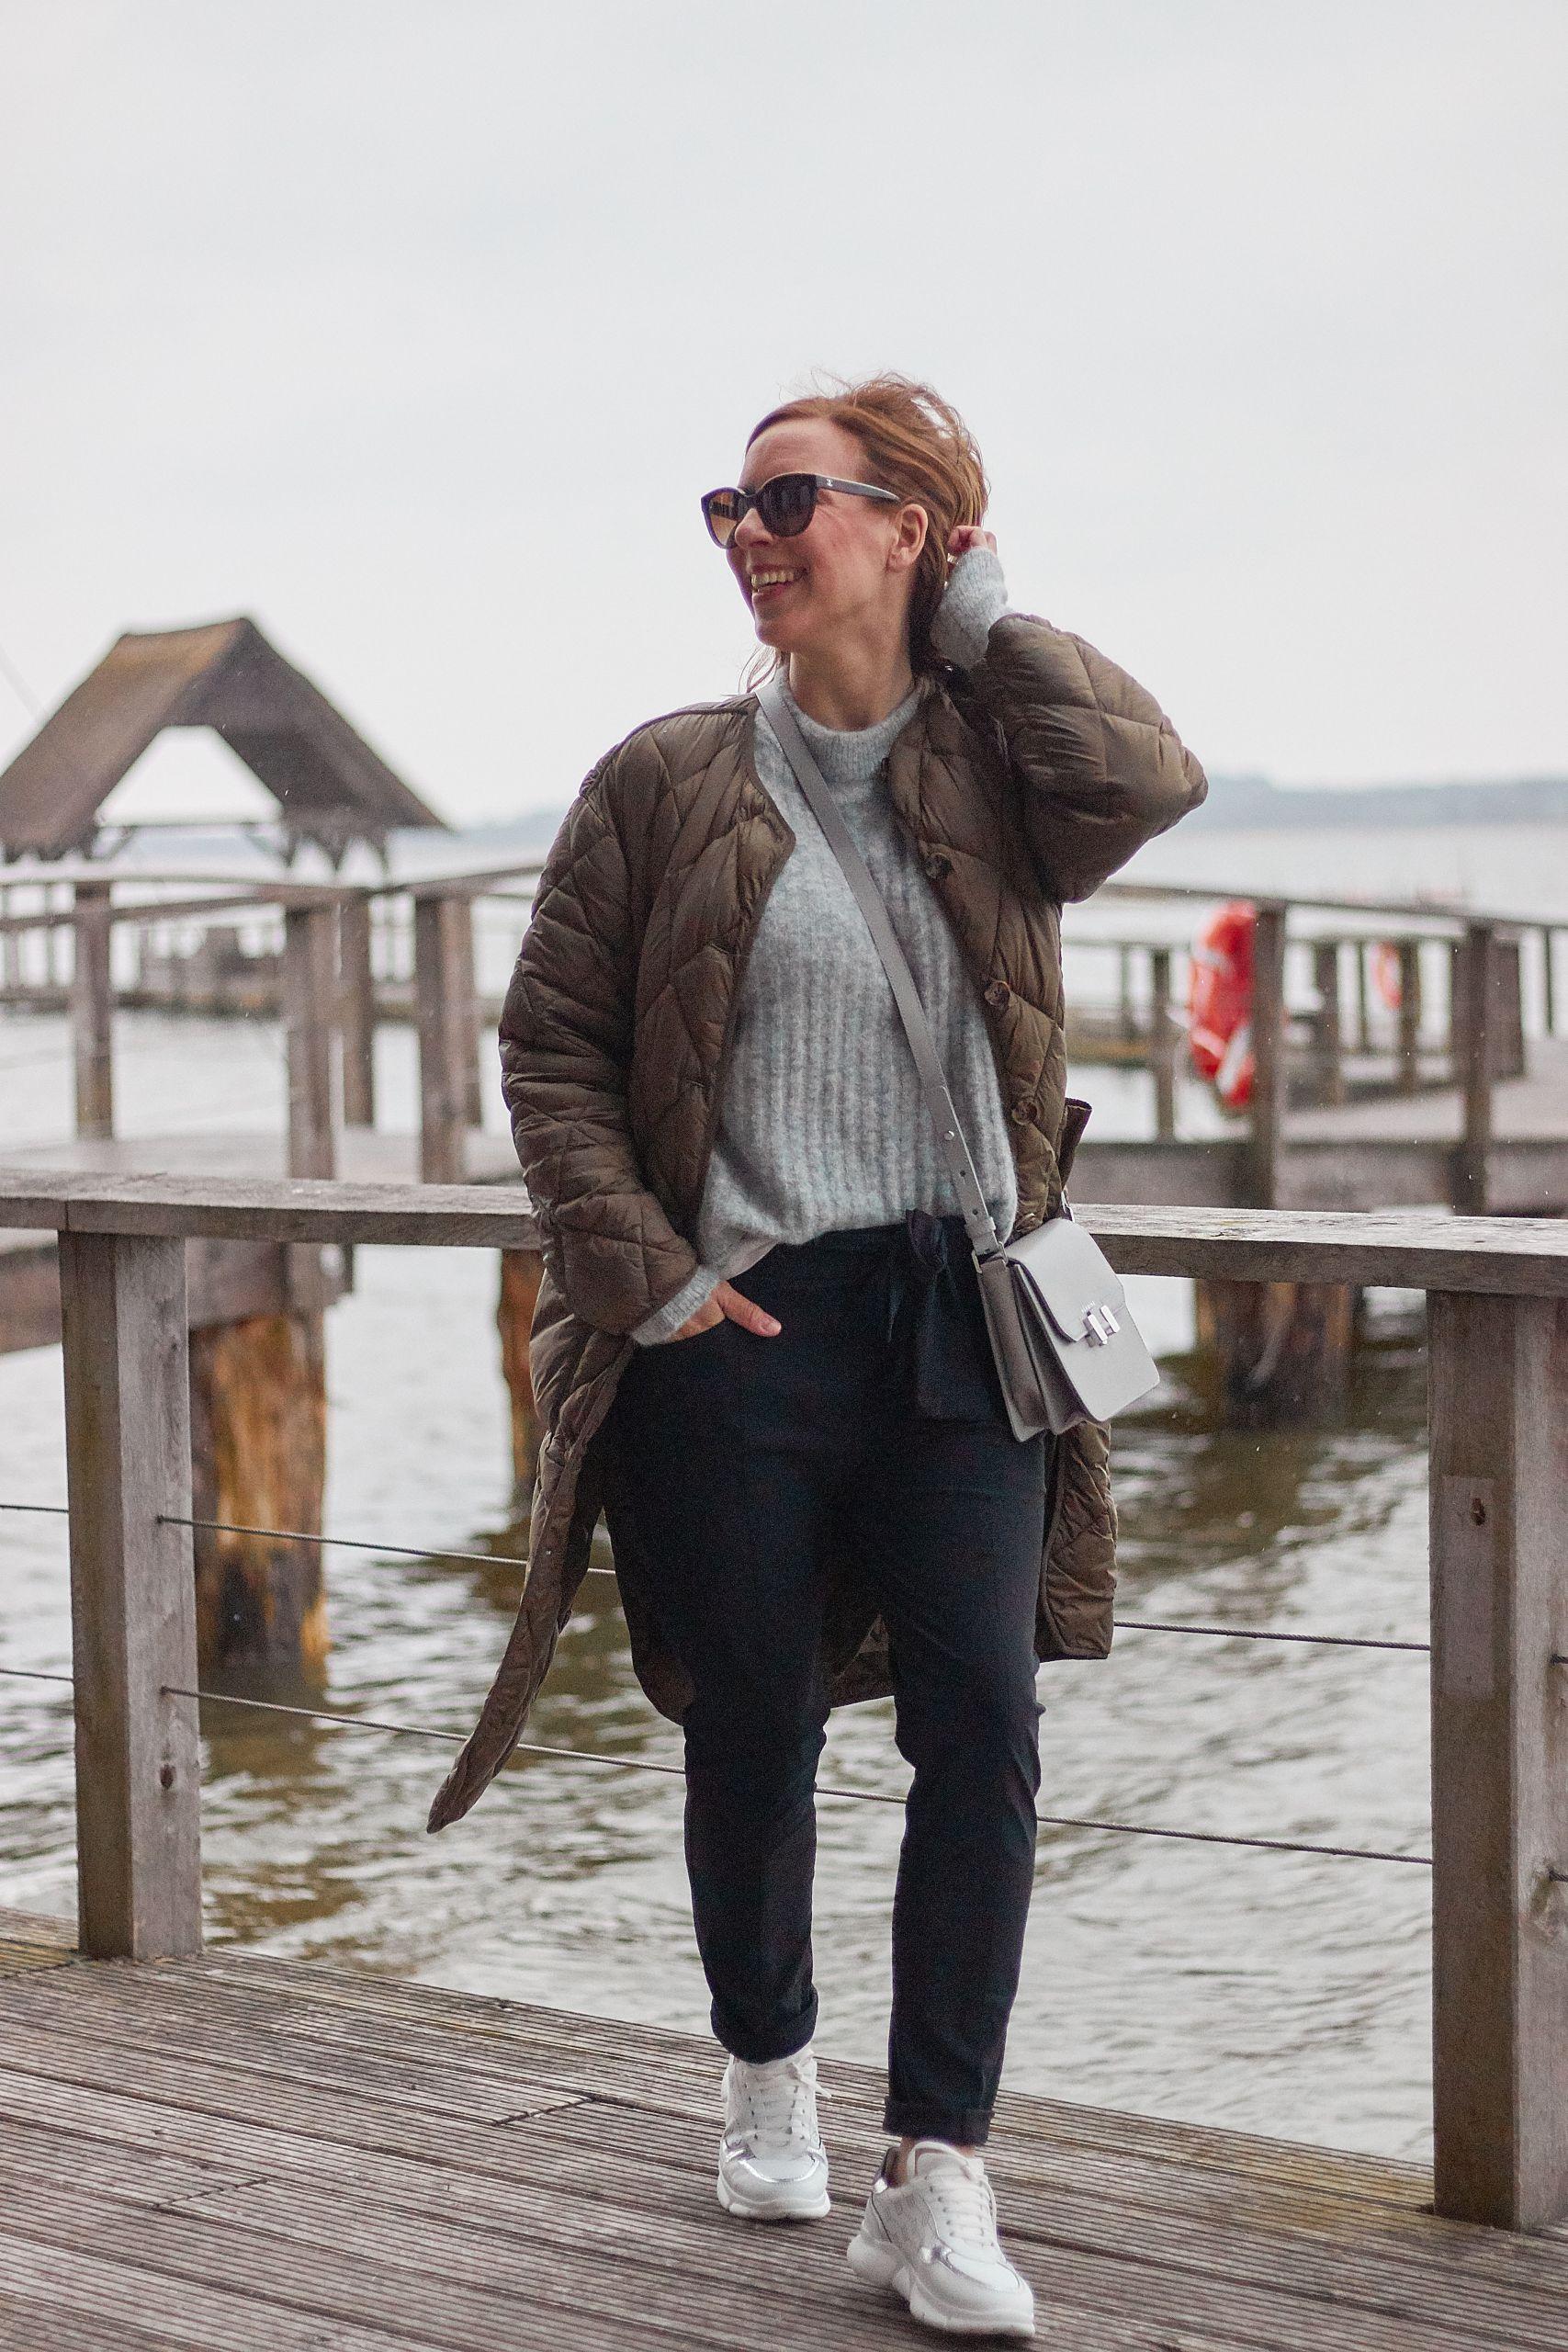 Jane Lushka Hose Pants Ida zum grauen Pullover am Hemmelsdorfer See